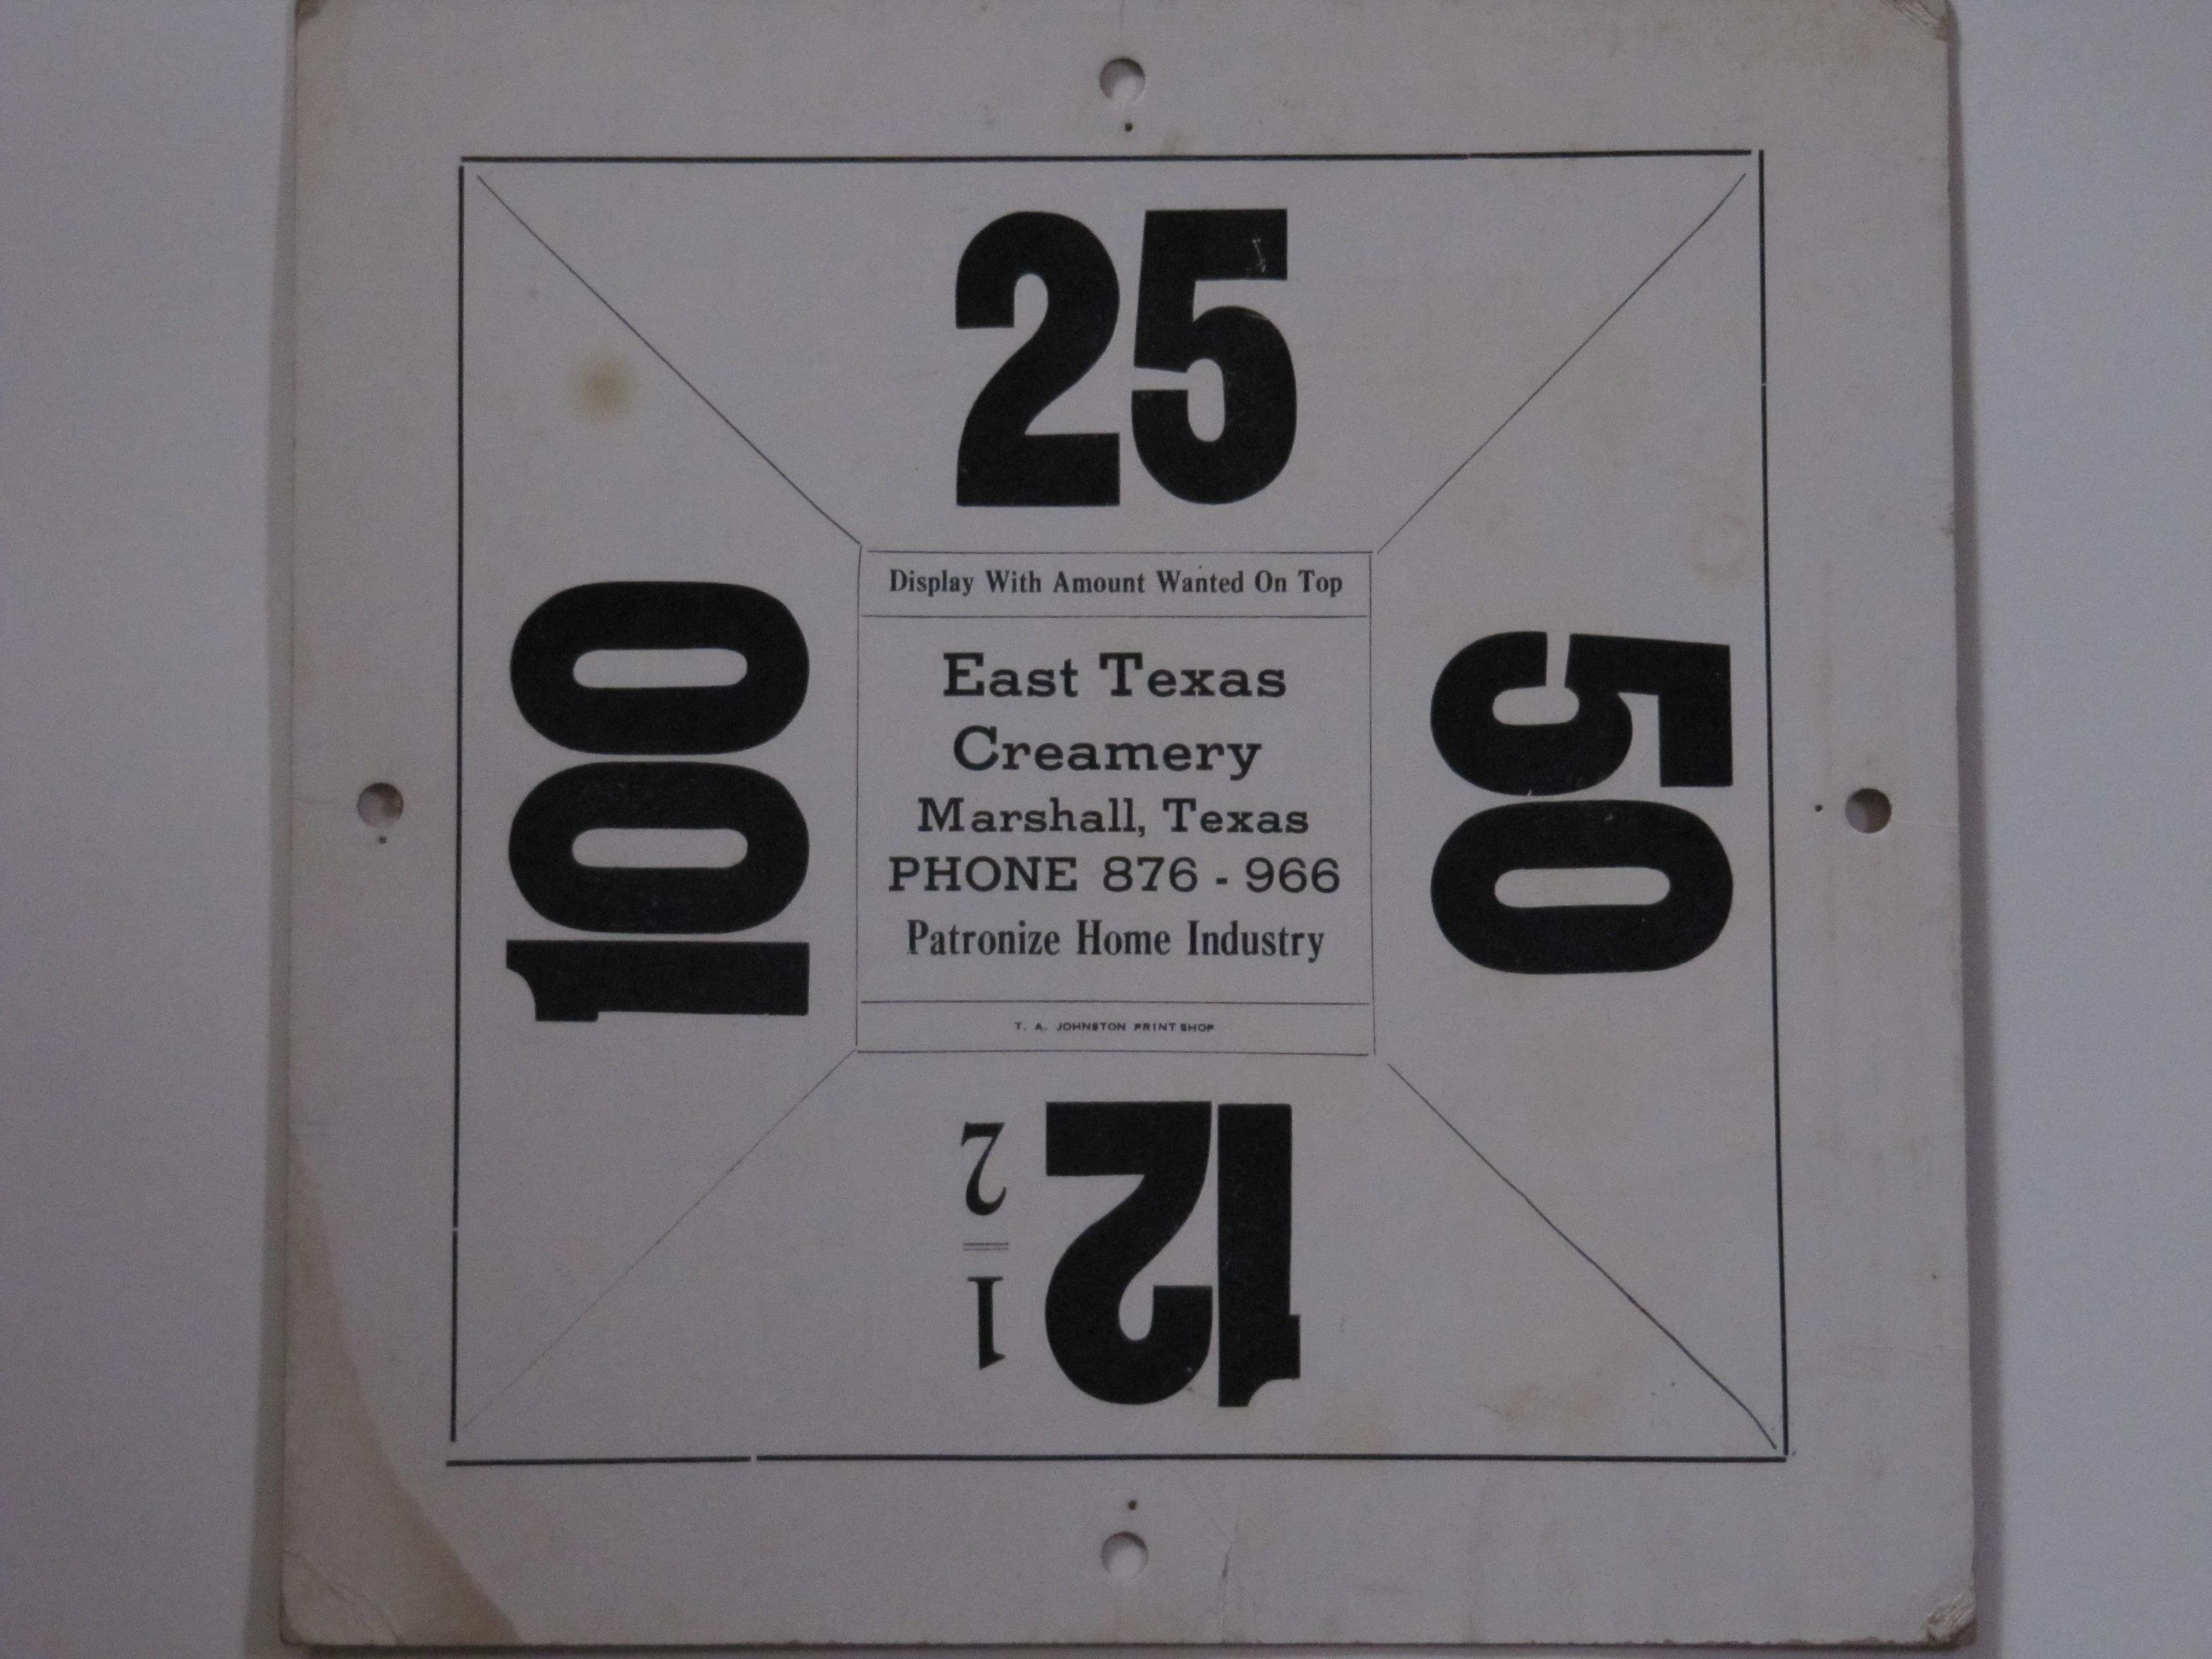 East Texas Creamery